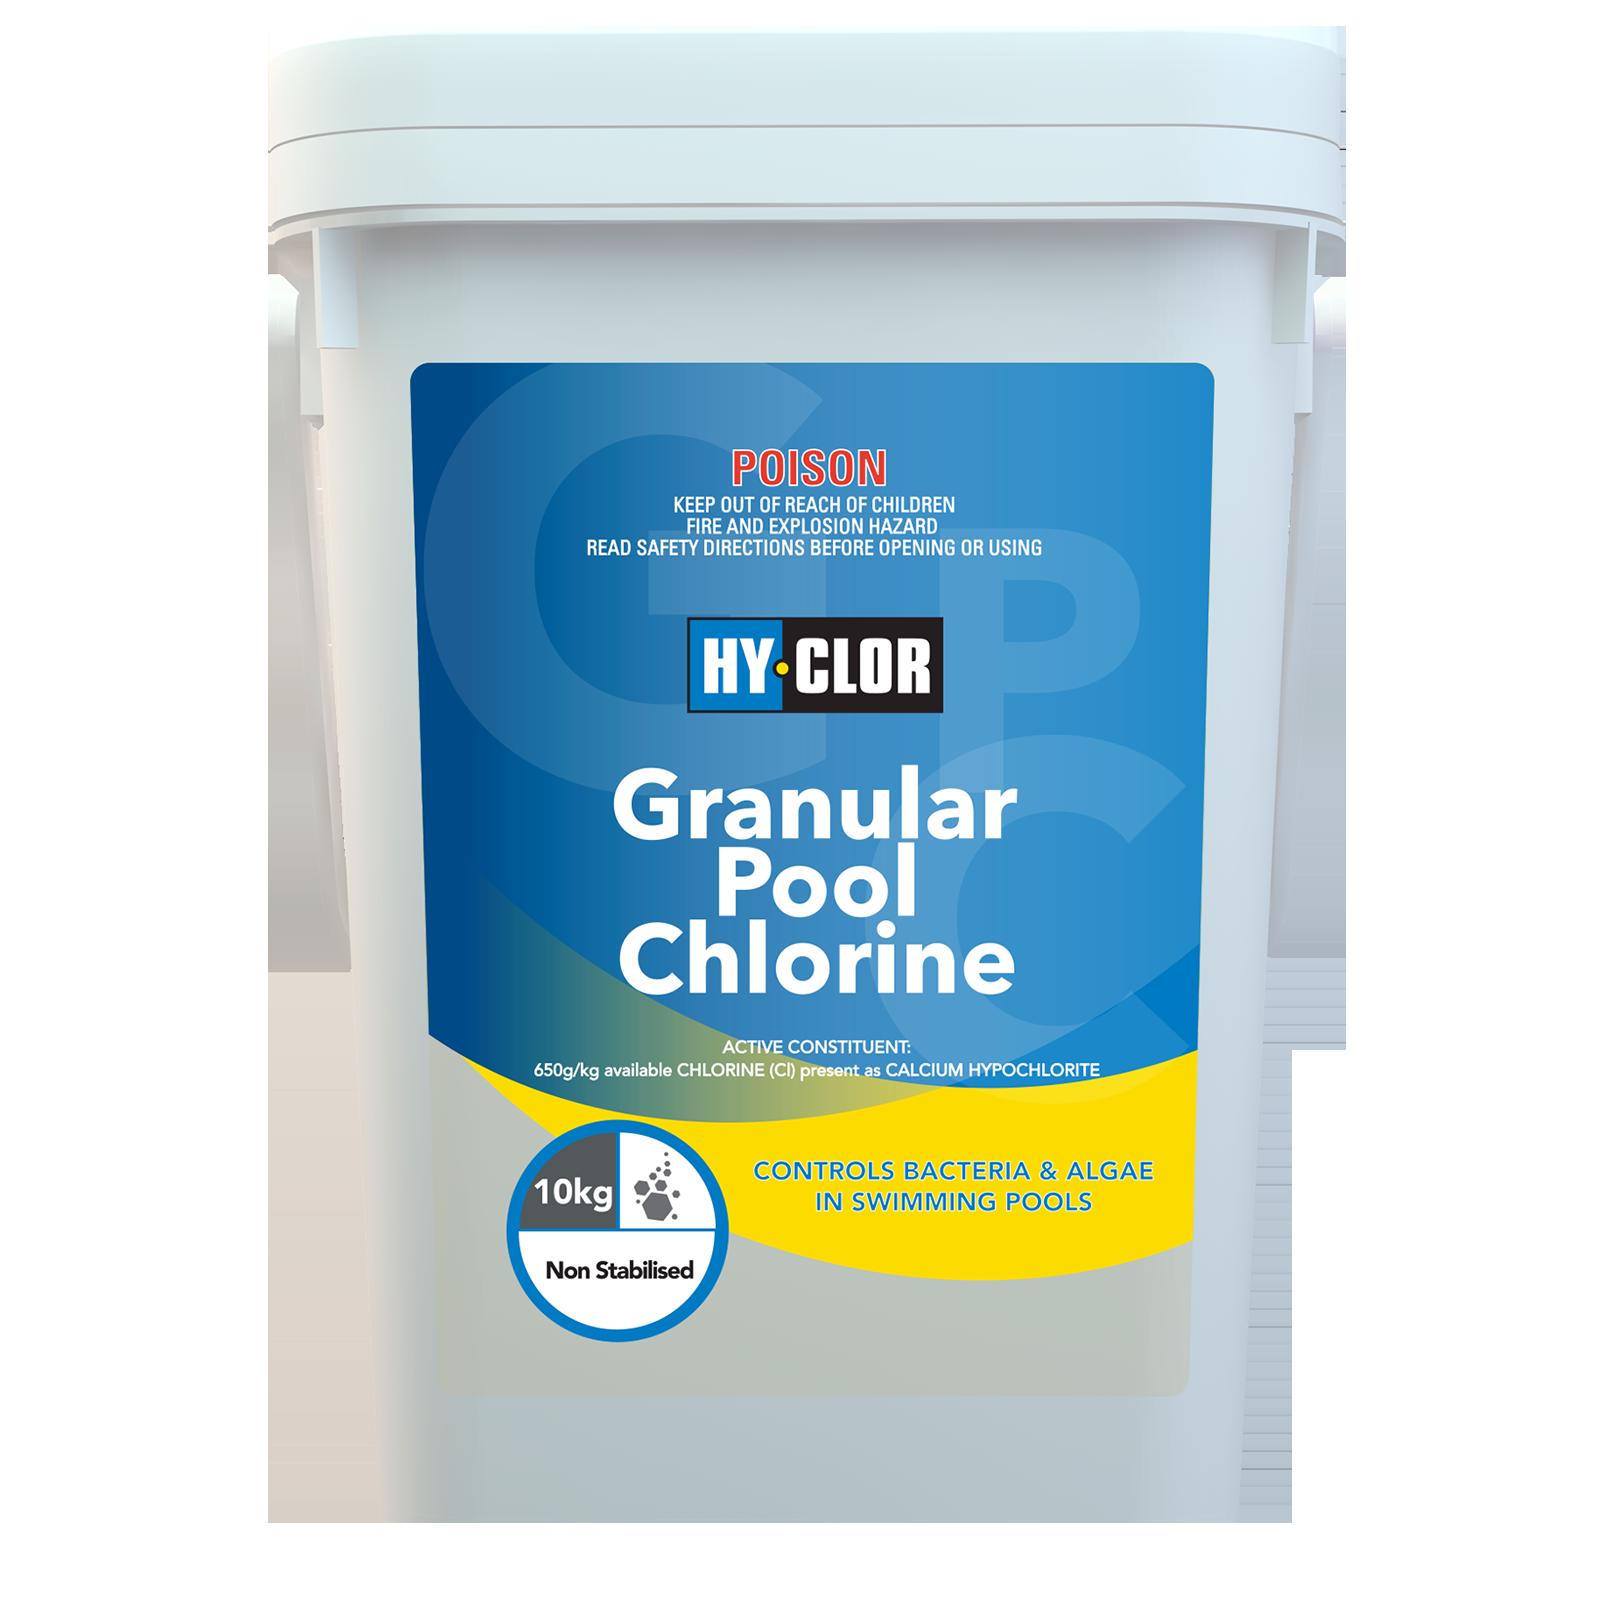 Hy-Clor 10kg Granular Pool Chlorine